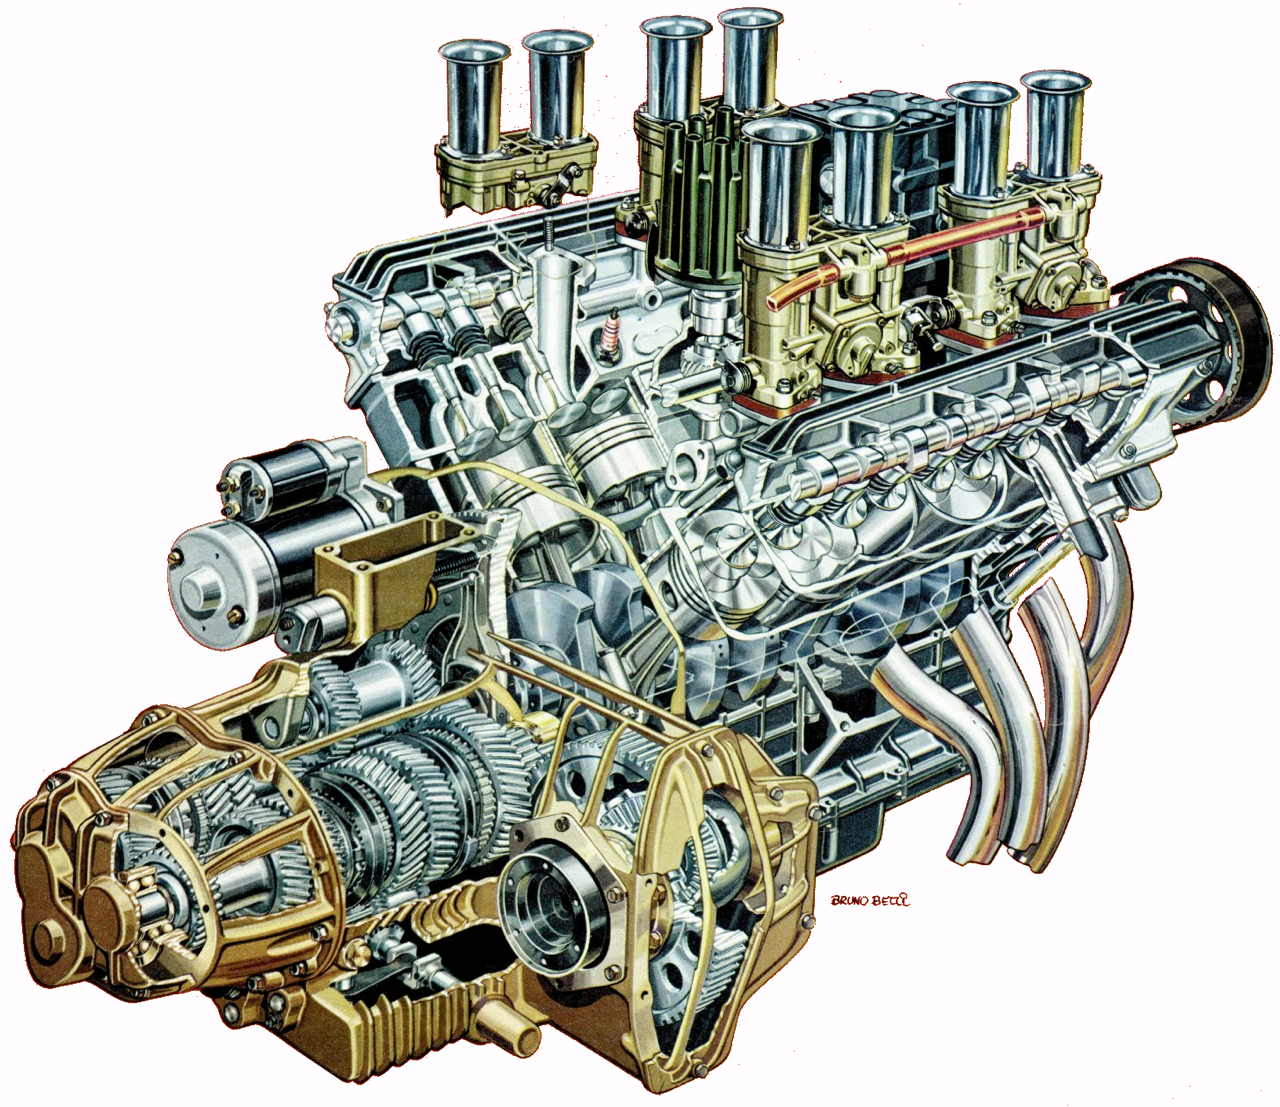 hight resolution of 1280x1107 v8 engine cutaway illustration race engines amp cutaways